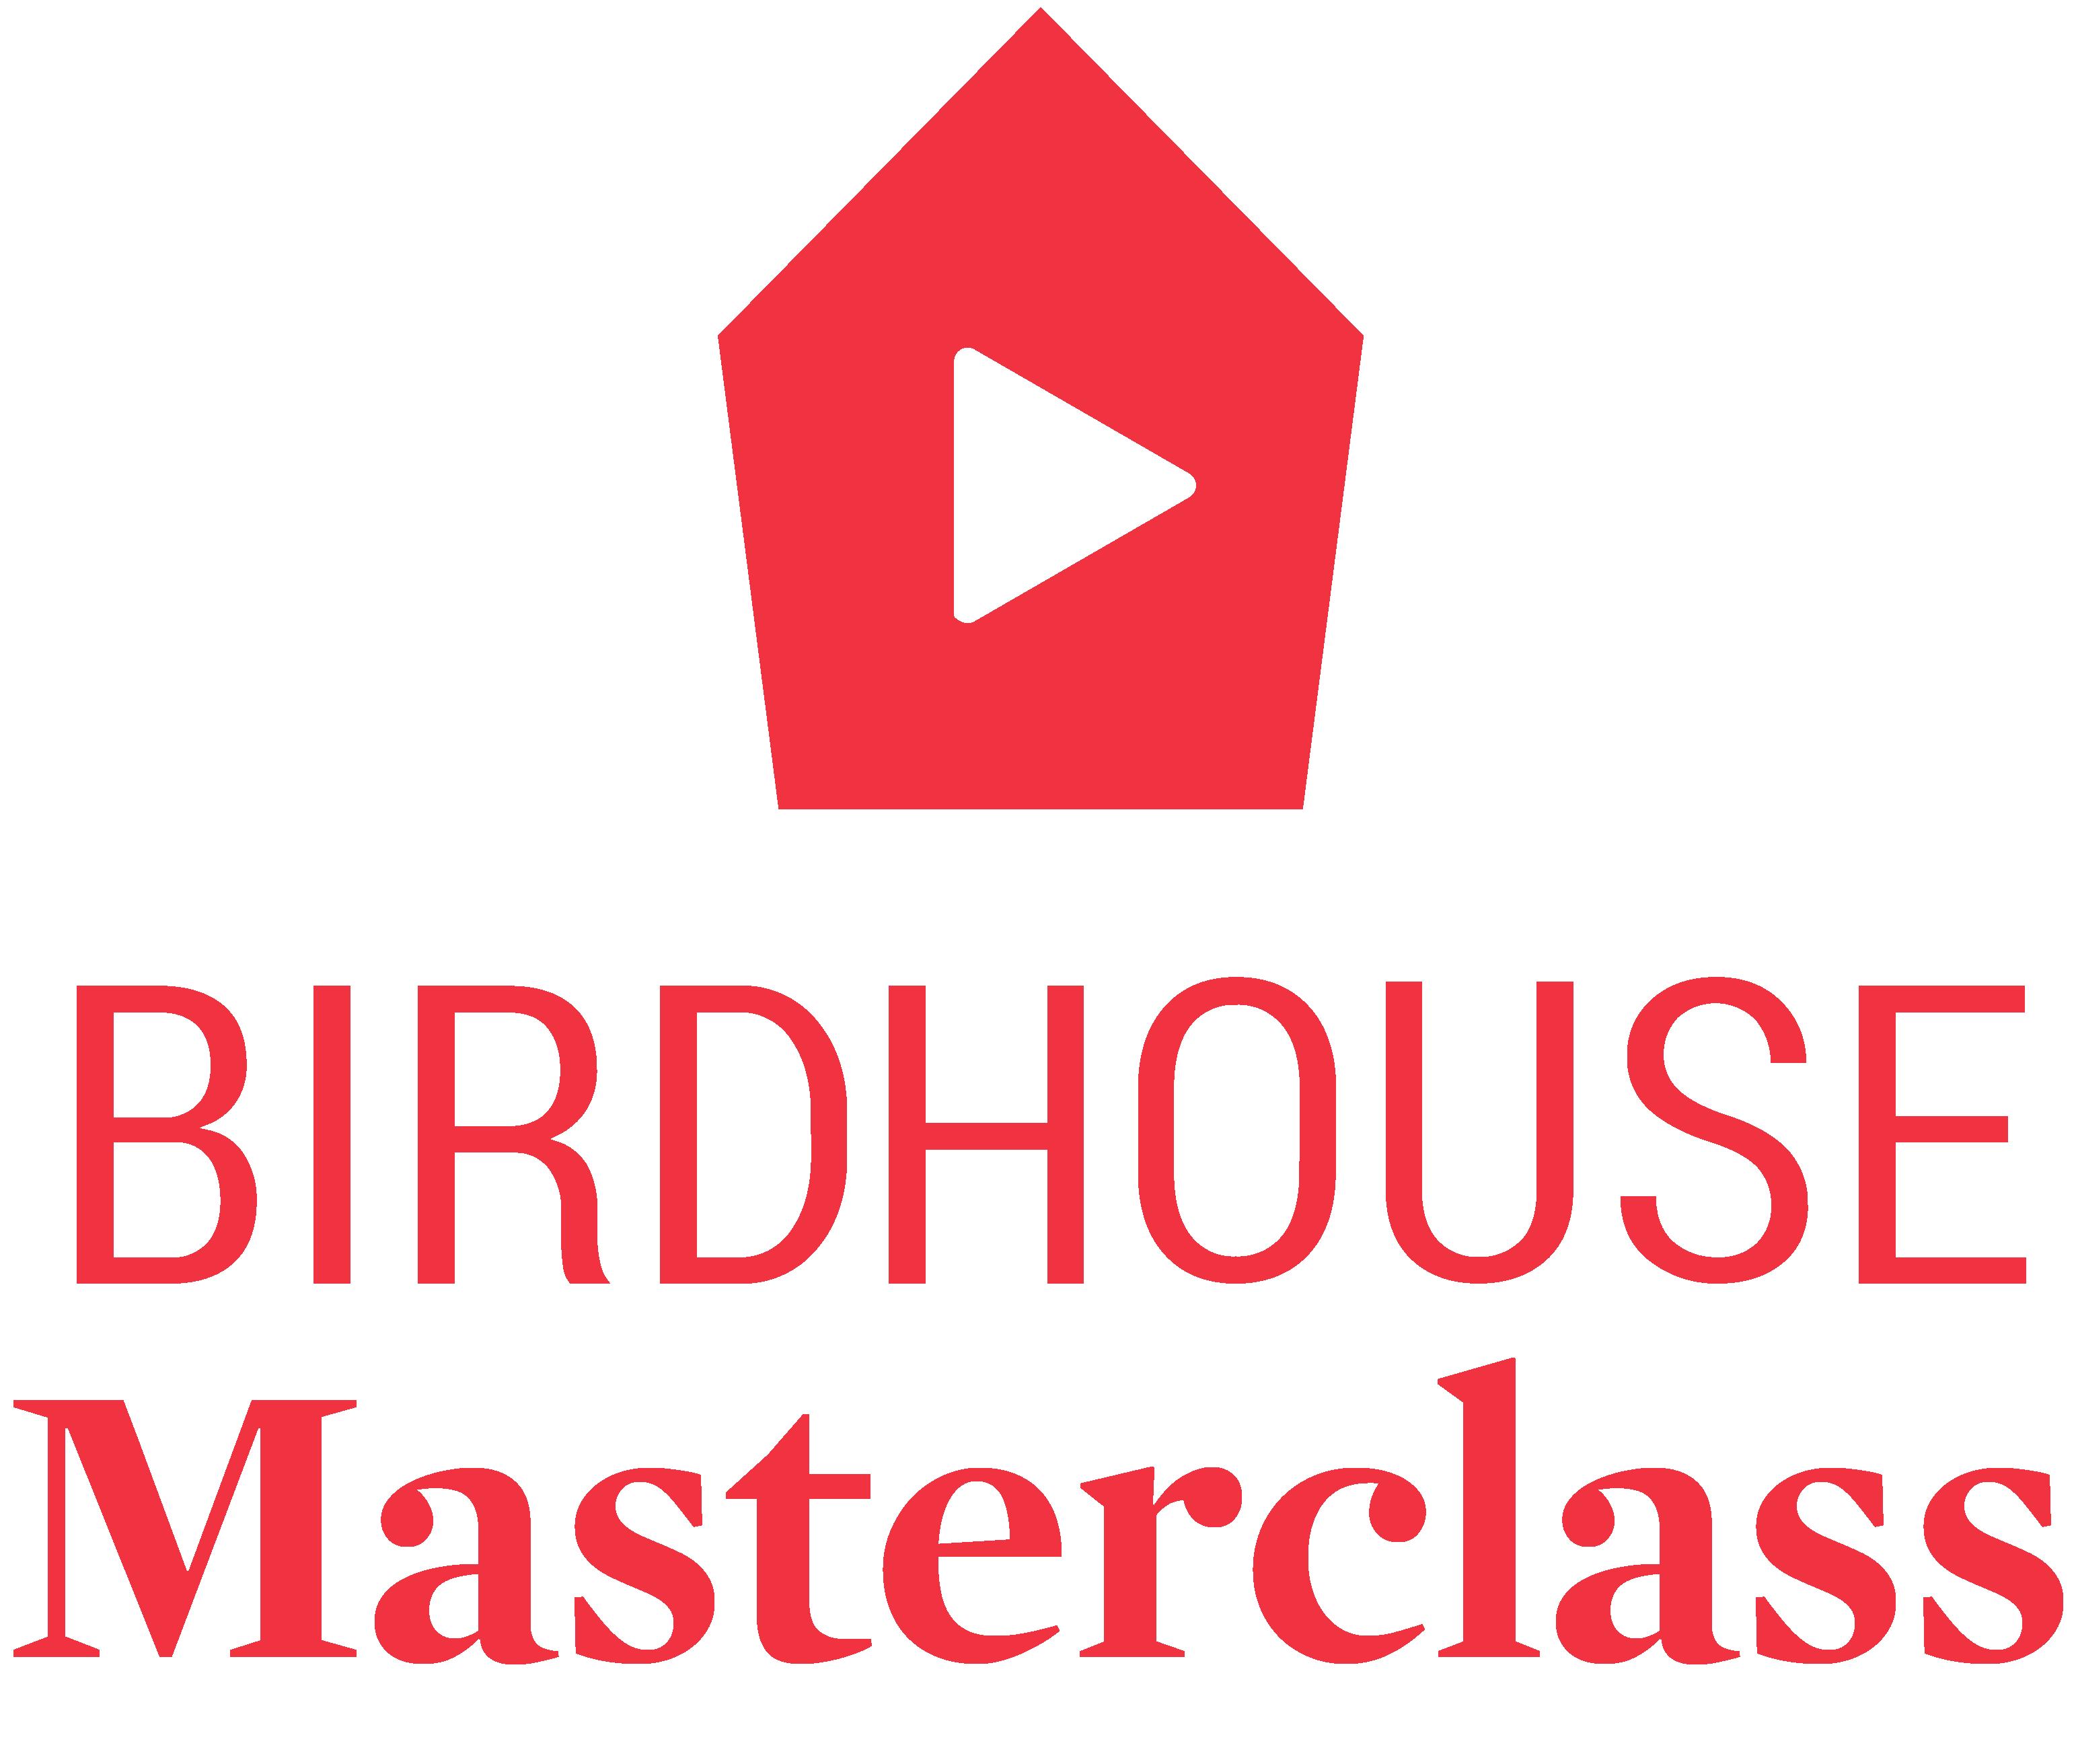 Birdhouse Masterclass